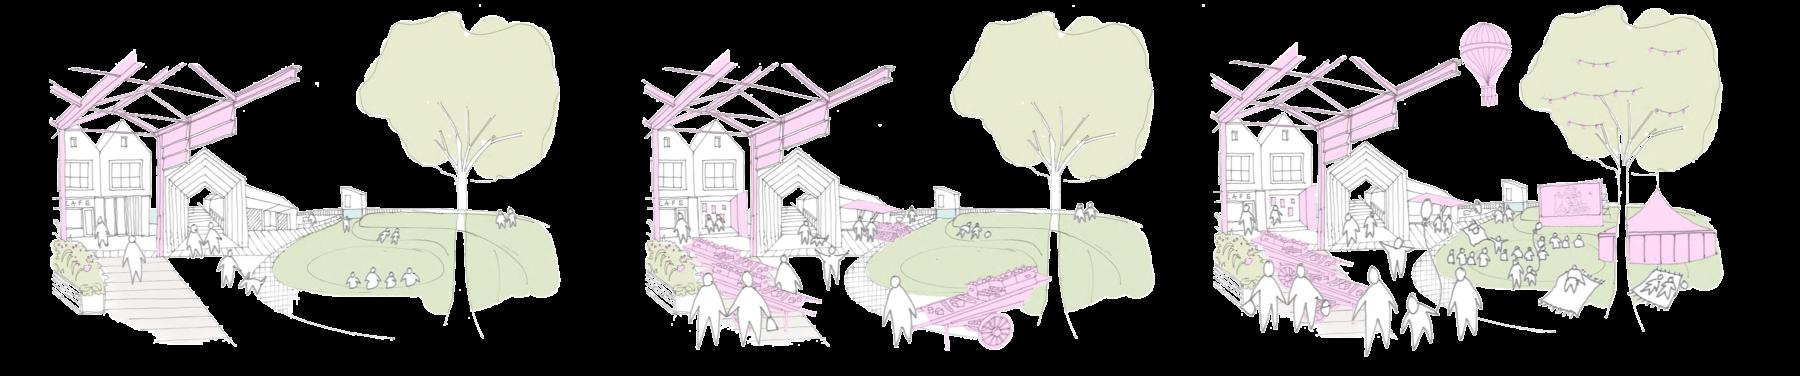 Sarah-Wigglesworth-Architects Soar-Island Everyday 3600